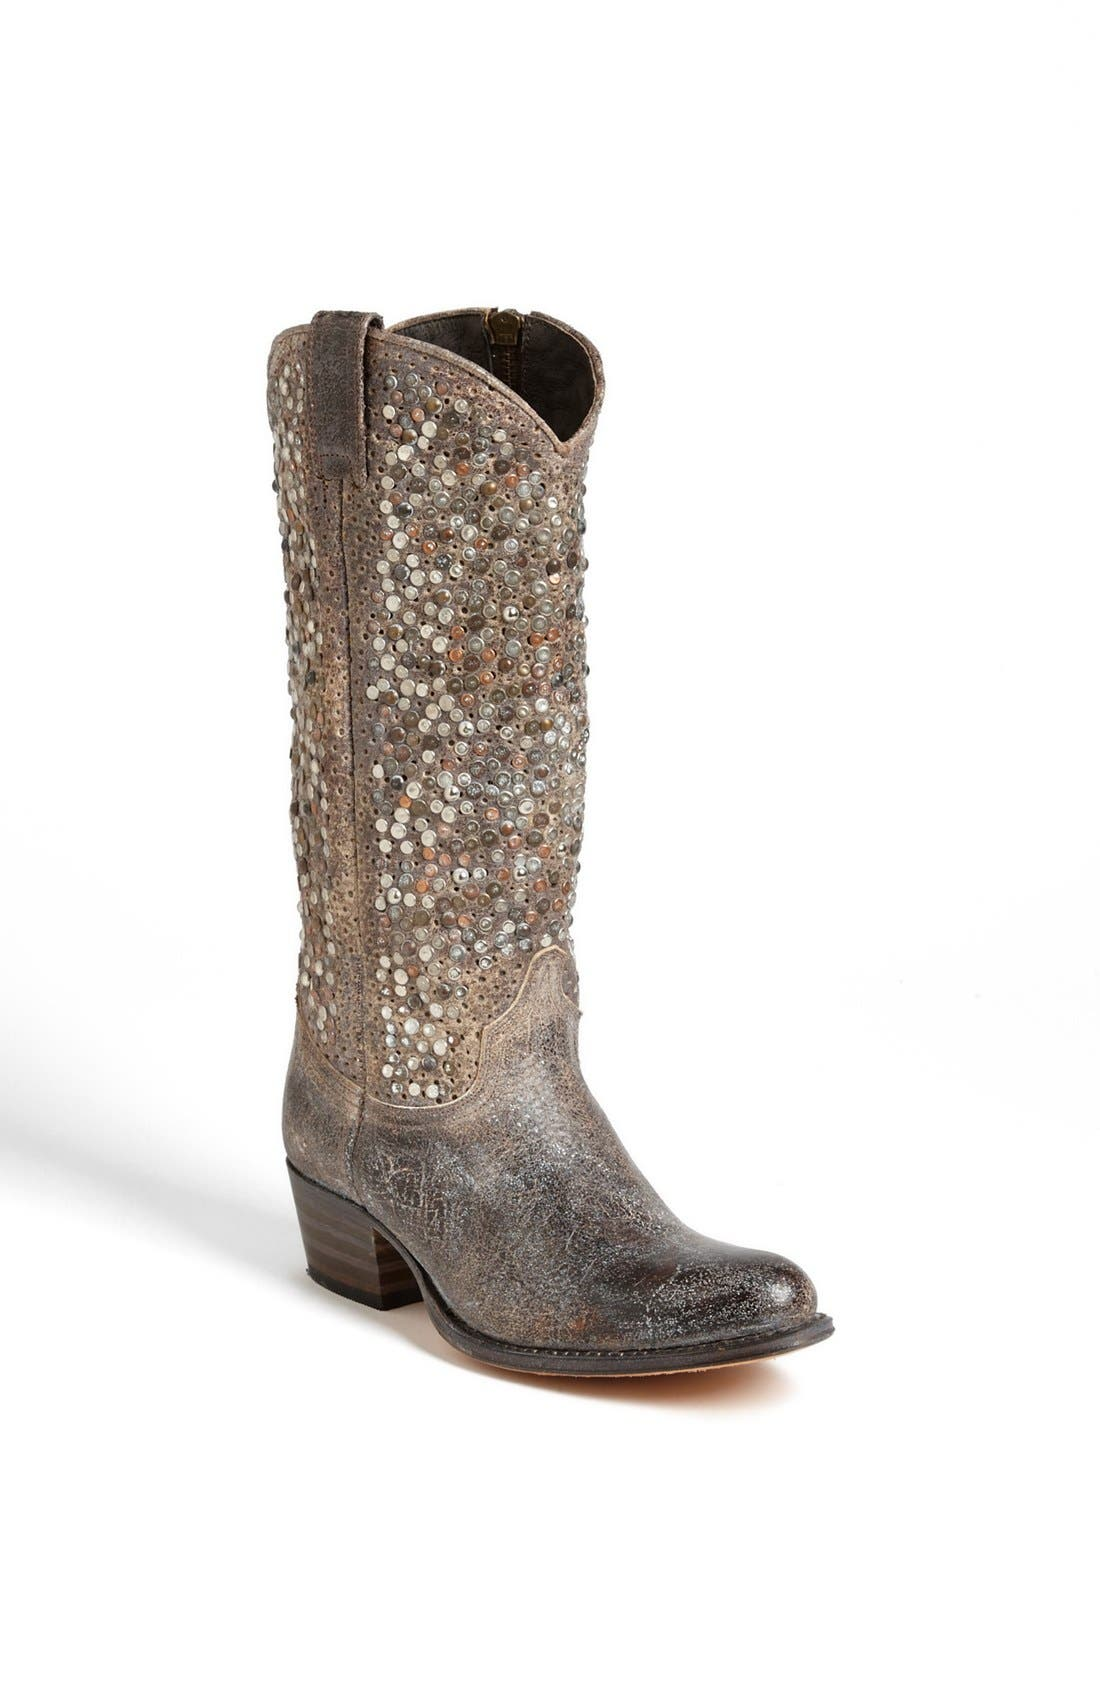 Main Image - Frye 'Deborah' Studded Boot